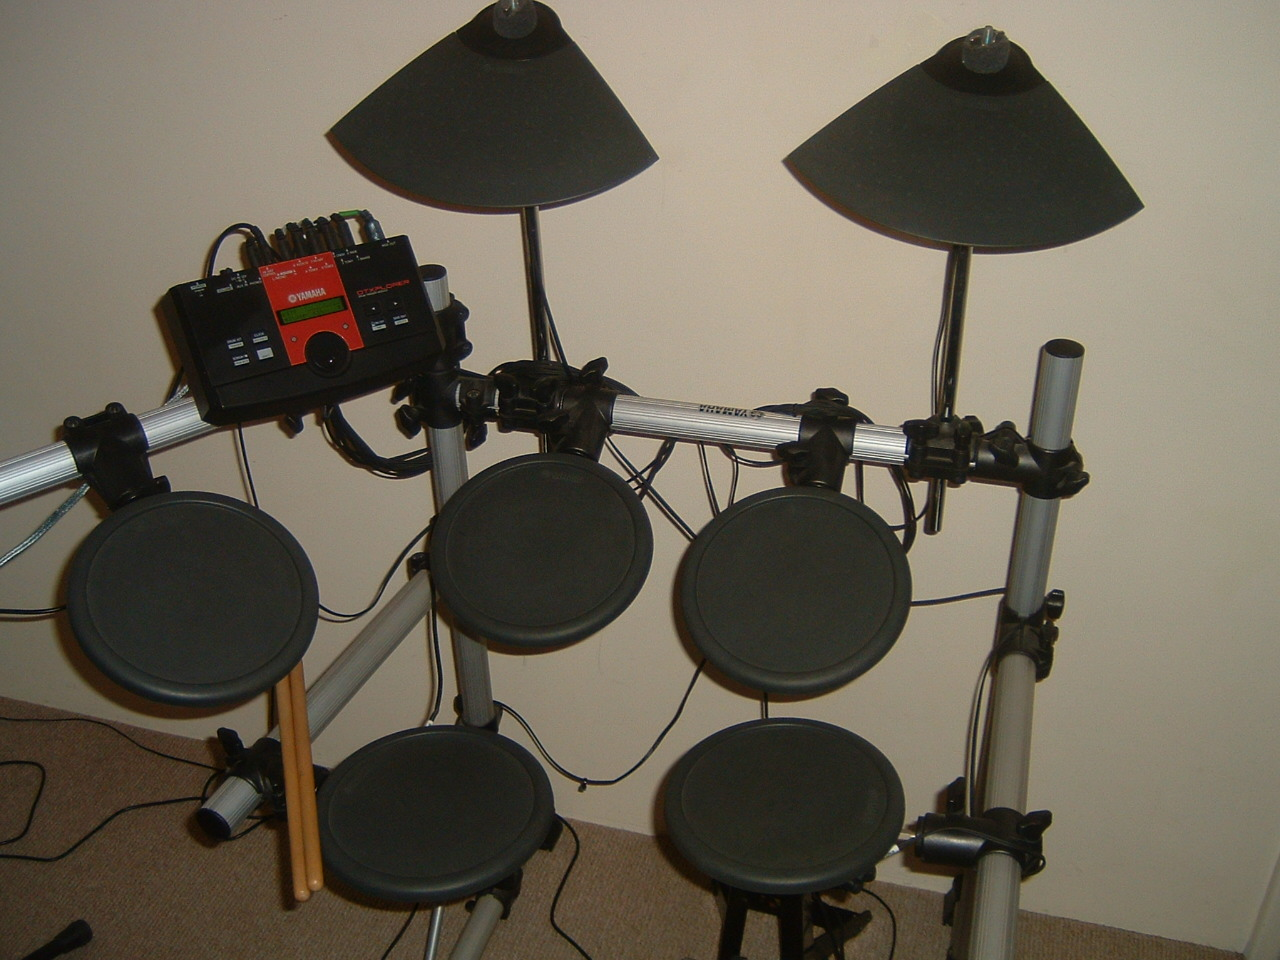 yamaha dtxplorer how to set it up with reason howtoprogramdrums com rh howtoprogramdrums com Yamaha DTXplorer Parts yamaha dtxplorer electronic drum kit manual